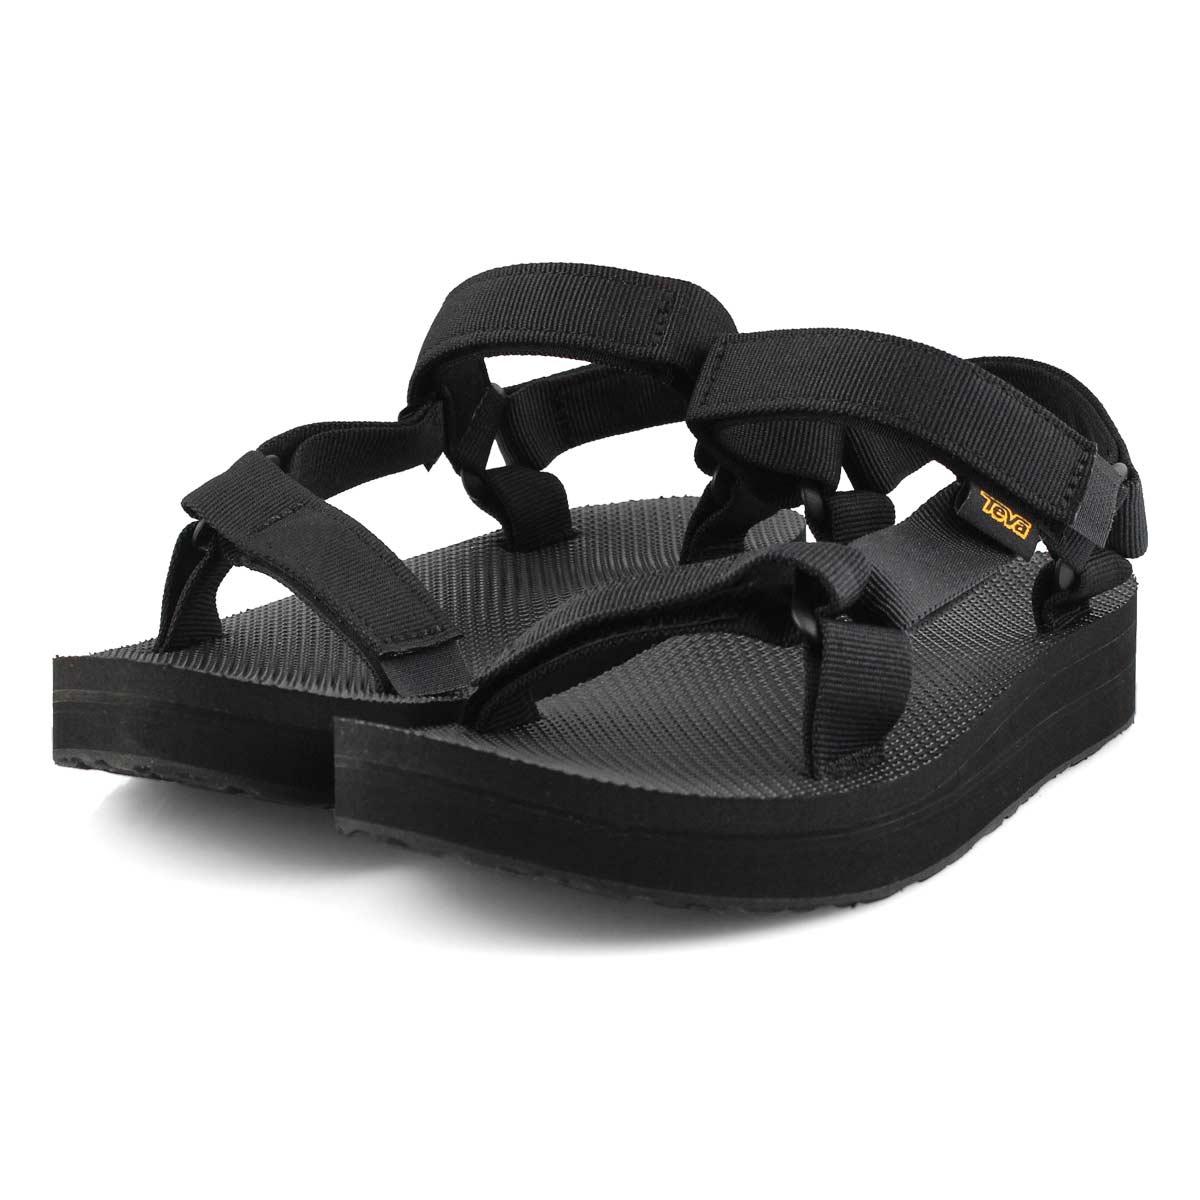 Women's Midform Universal Sport Sandal - Black